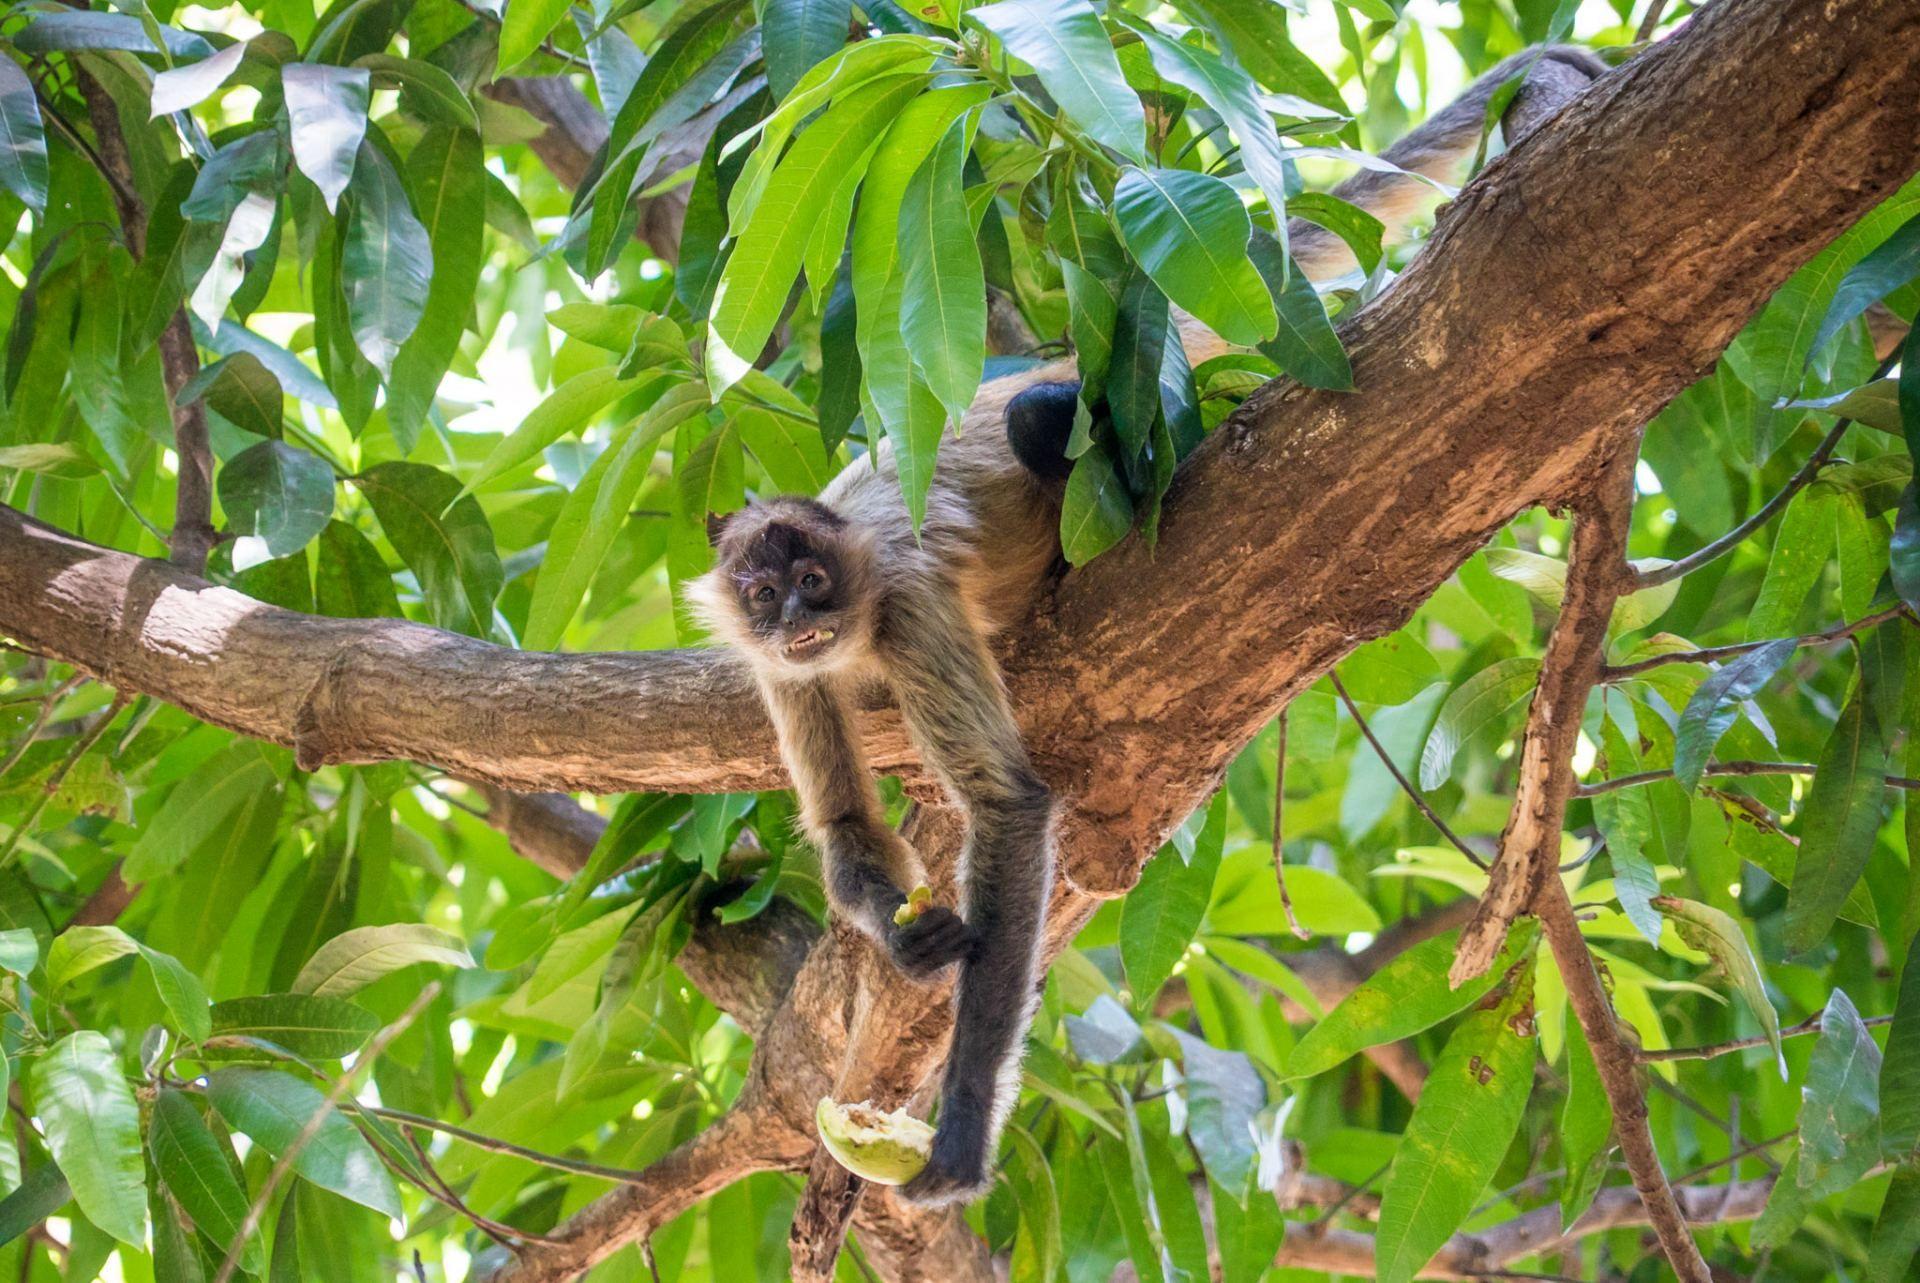 Costa Rica Monkeys Best Location & Easy Tips For